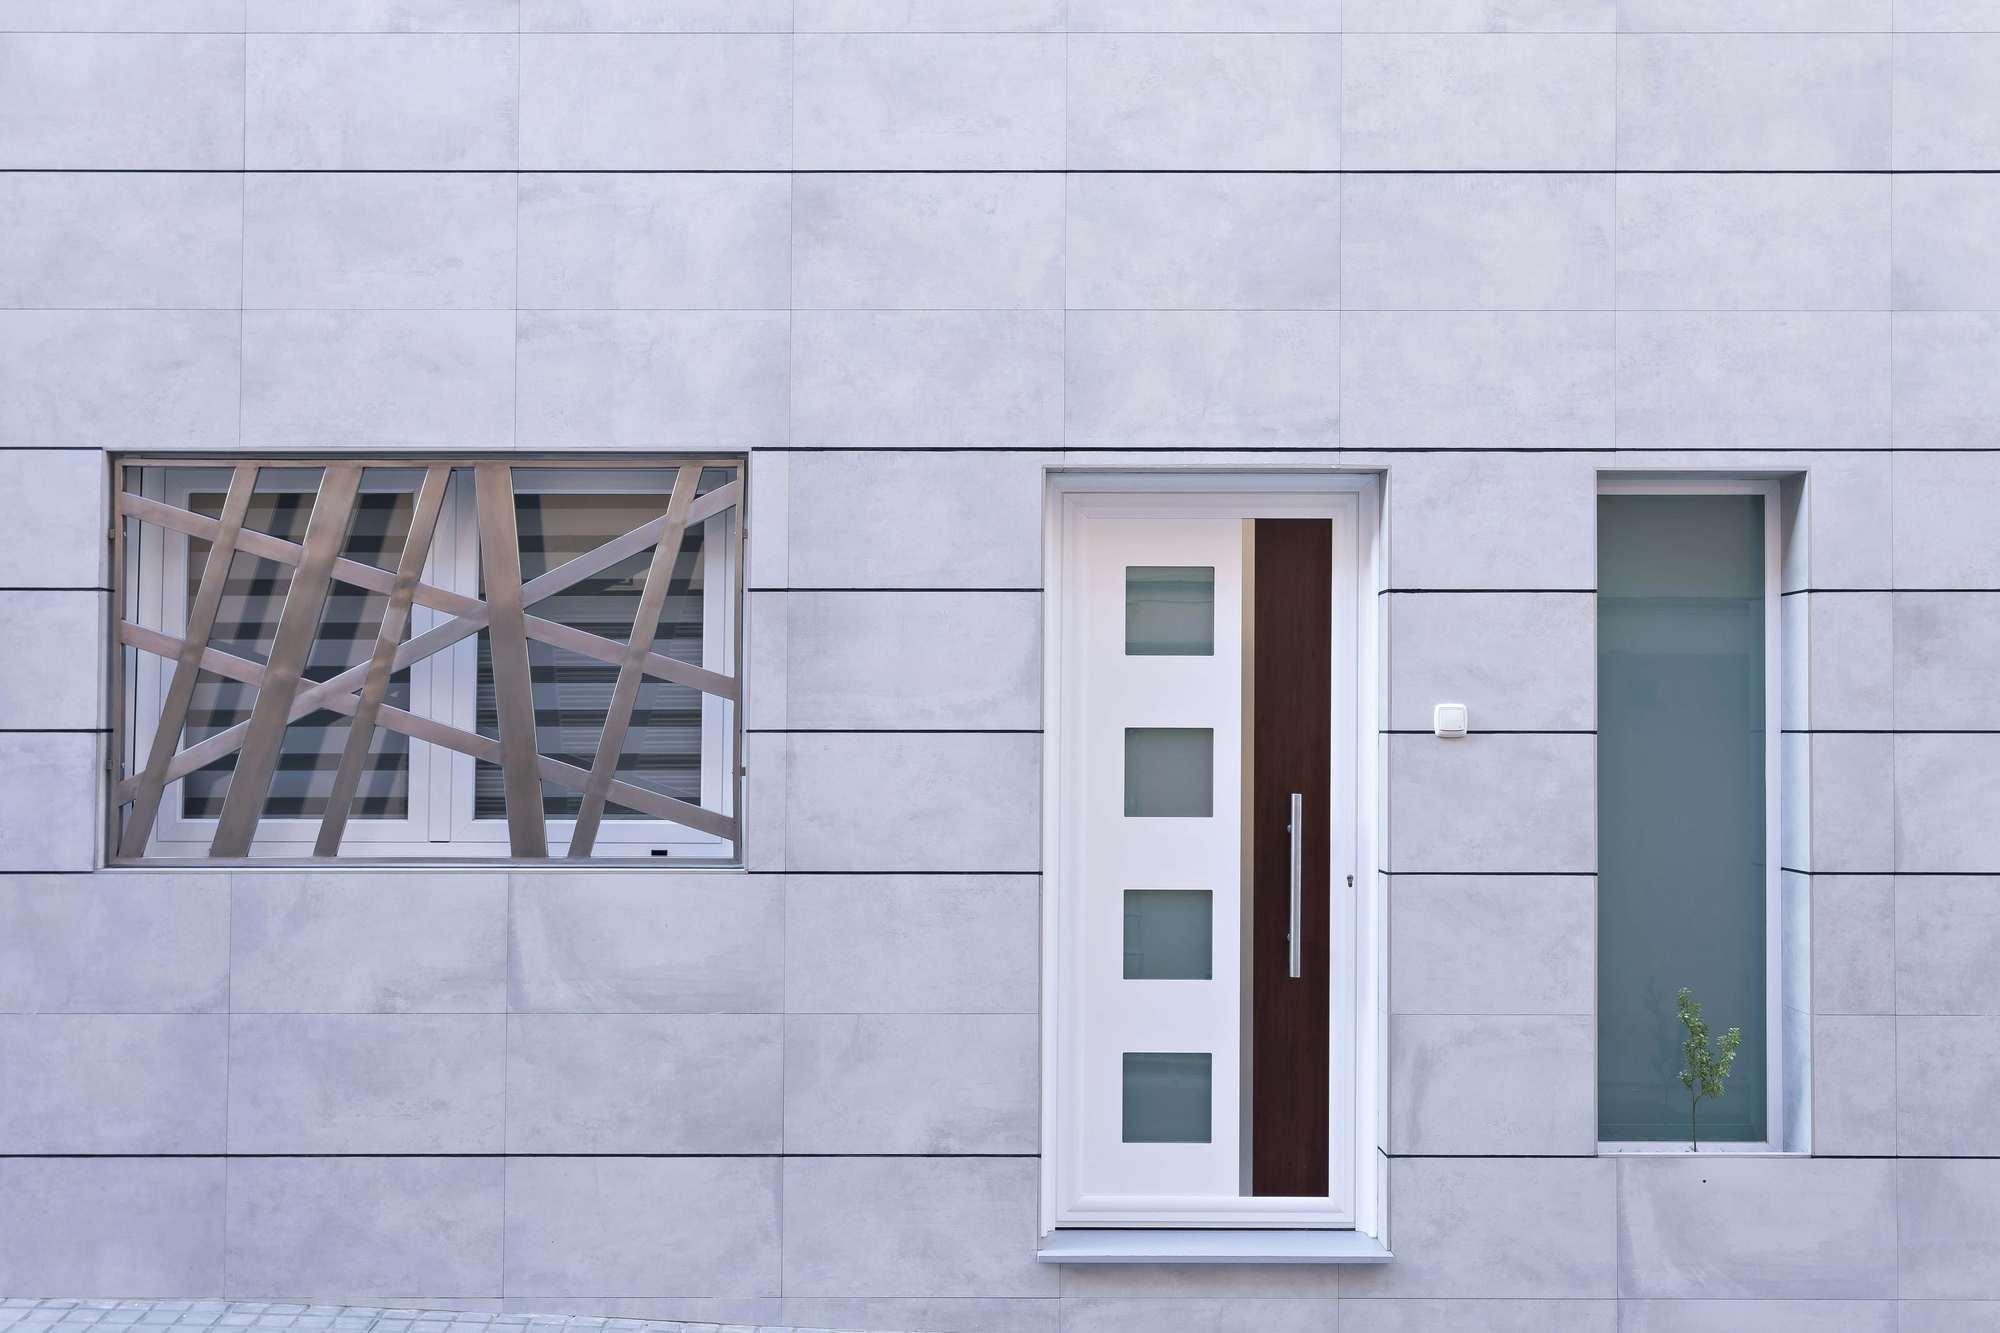 Almeria Tag Plataforma Arquitectura # Muebles Ramirez Almeria